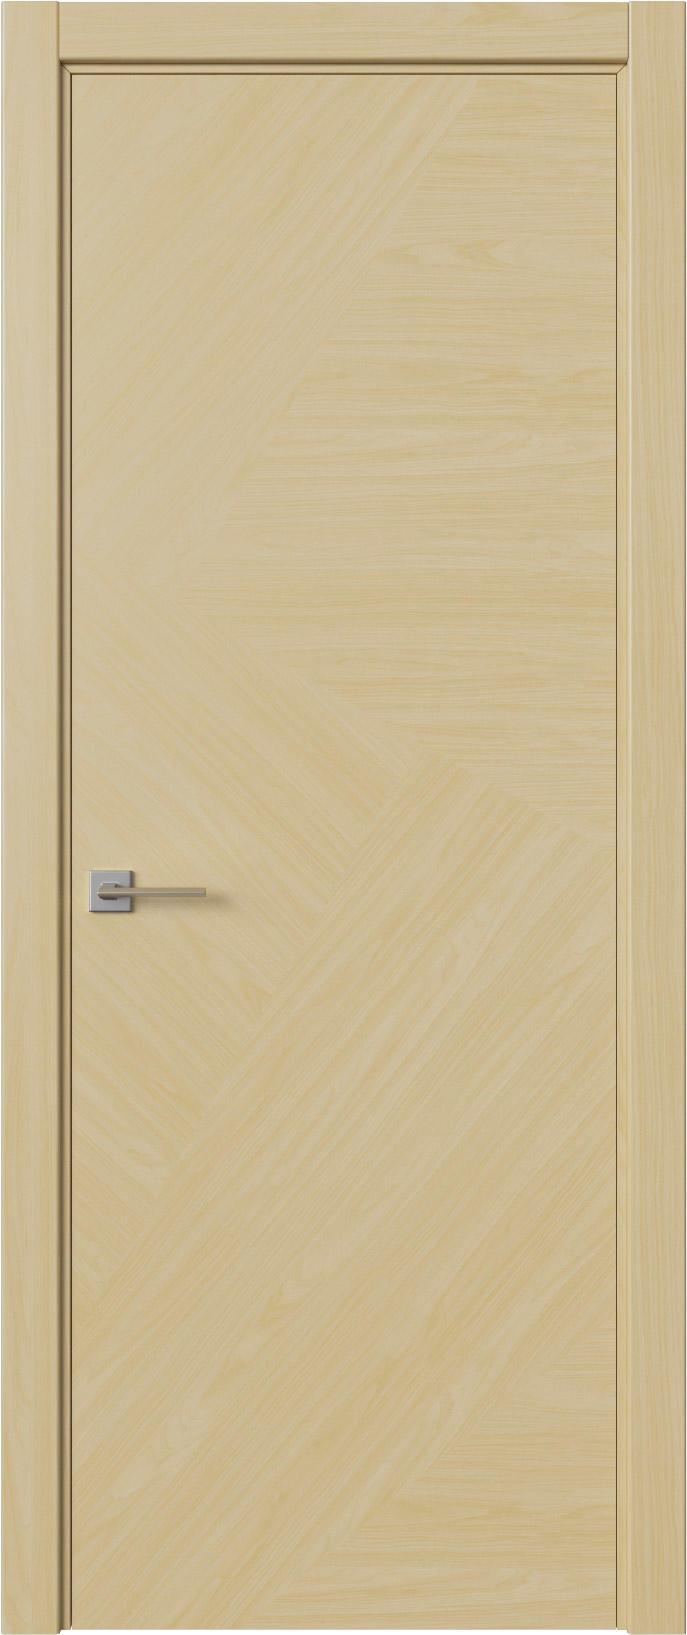 Tivoli М-1 цвет - Дуб нордик Без стекла (ДГ)